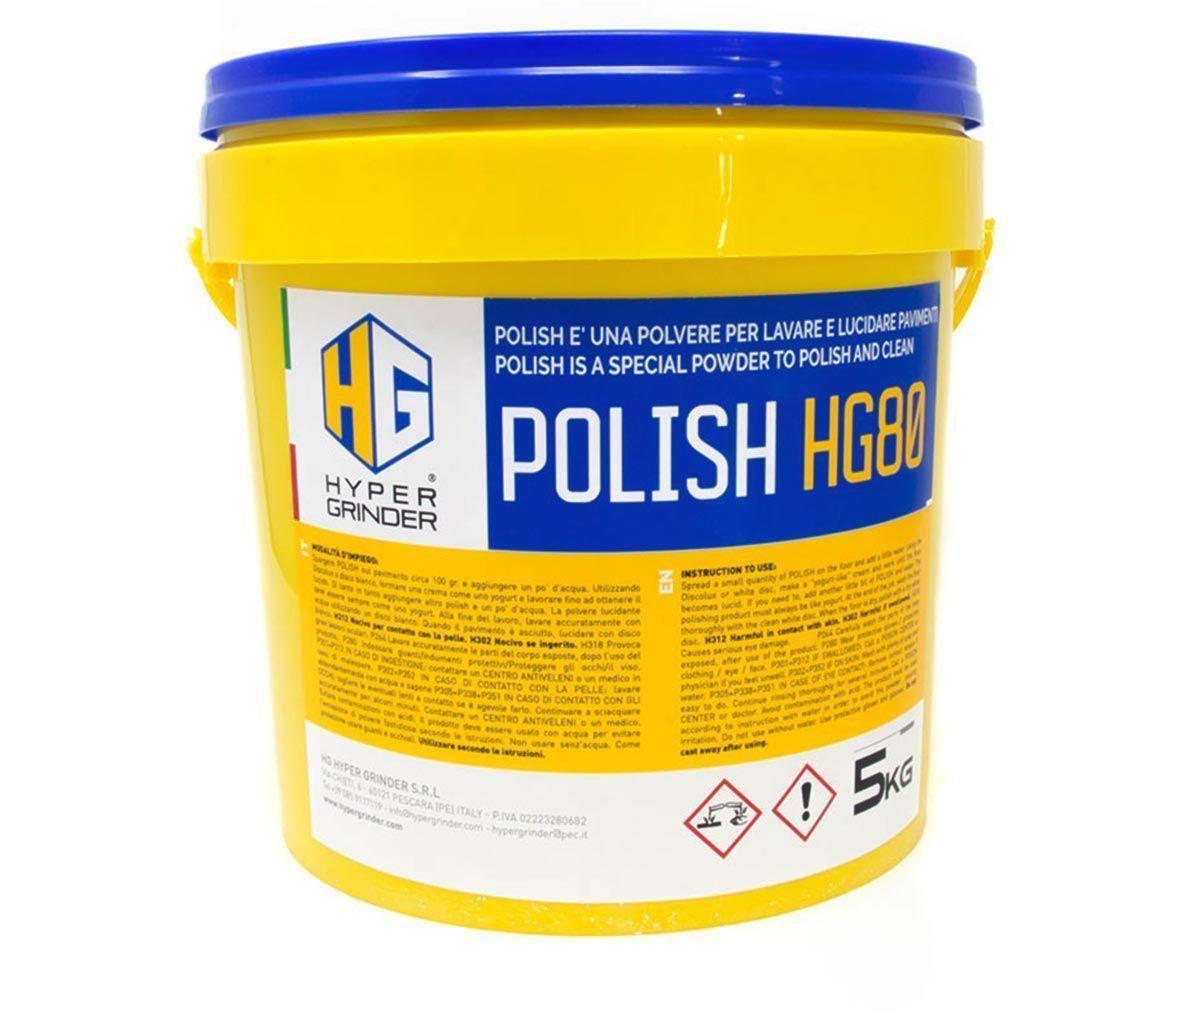 polishhg85 1239